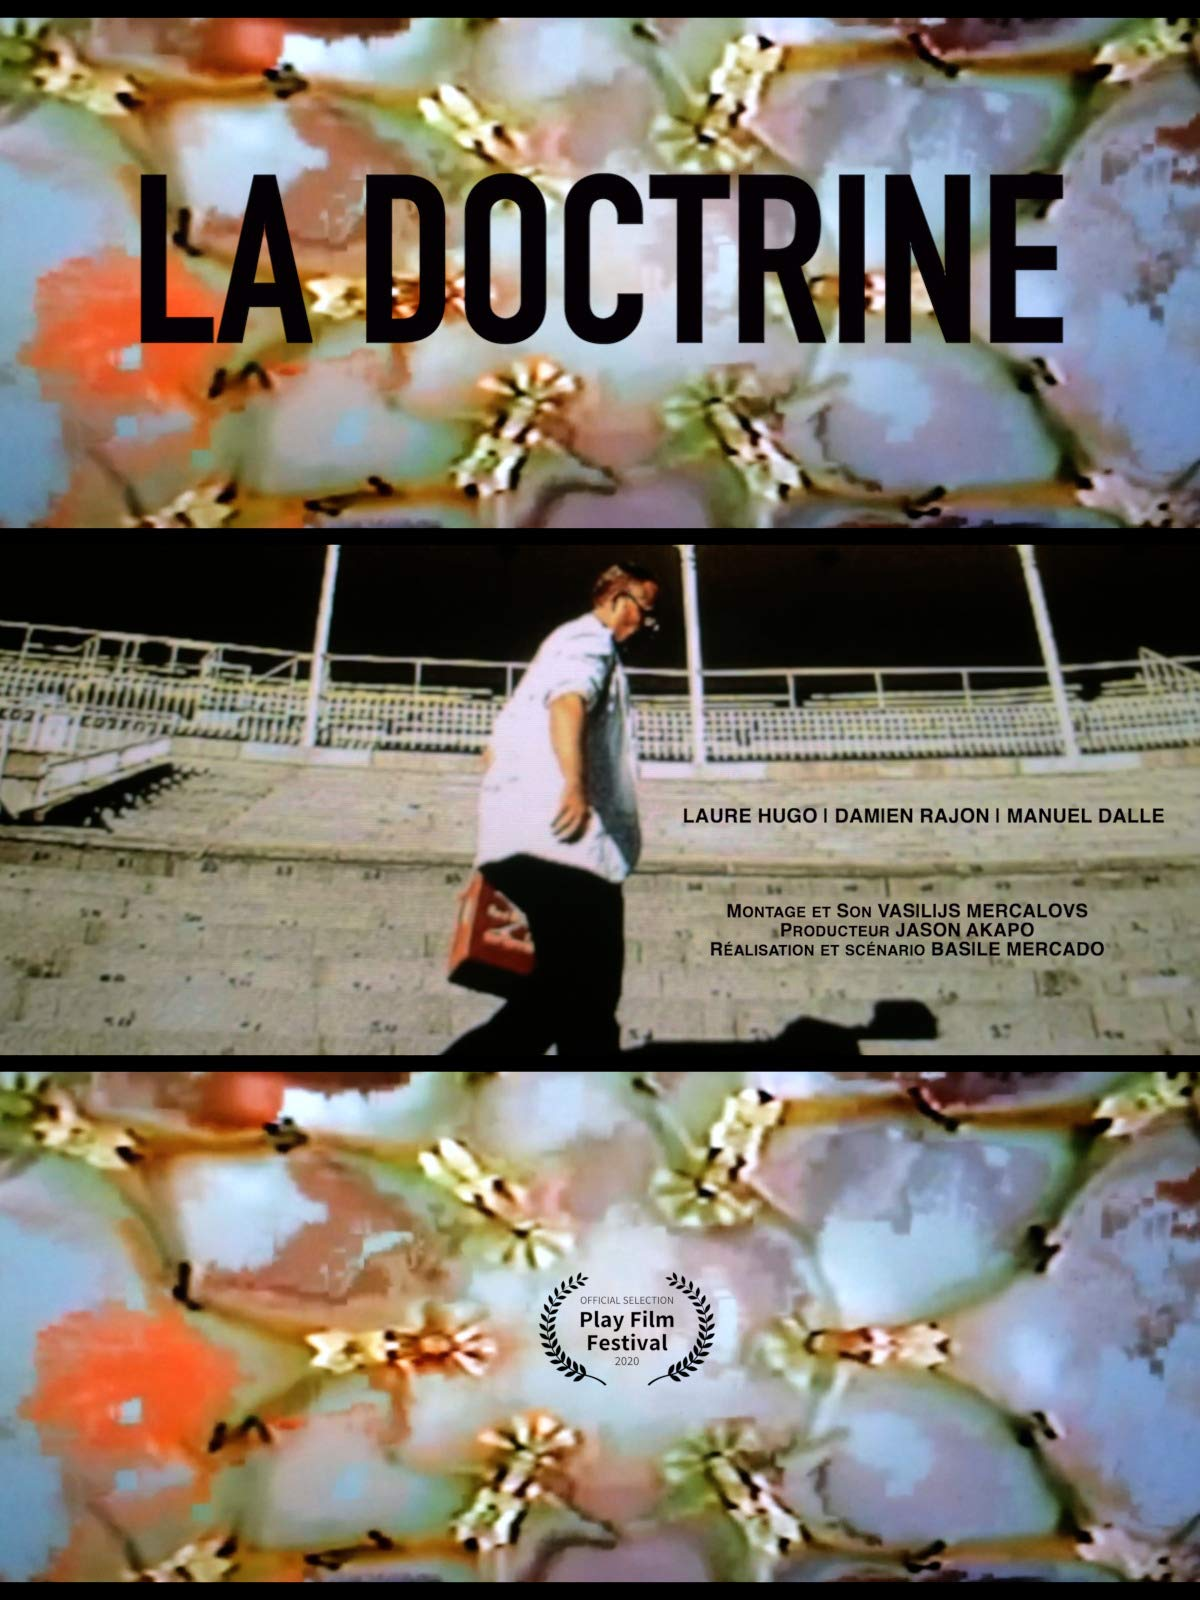 La Doctrine